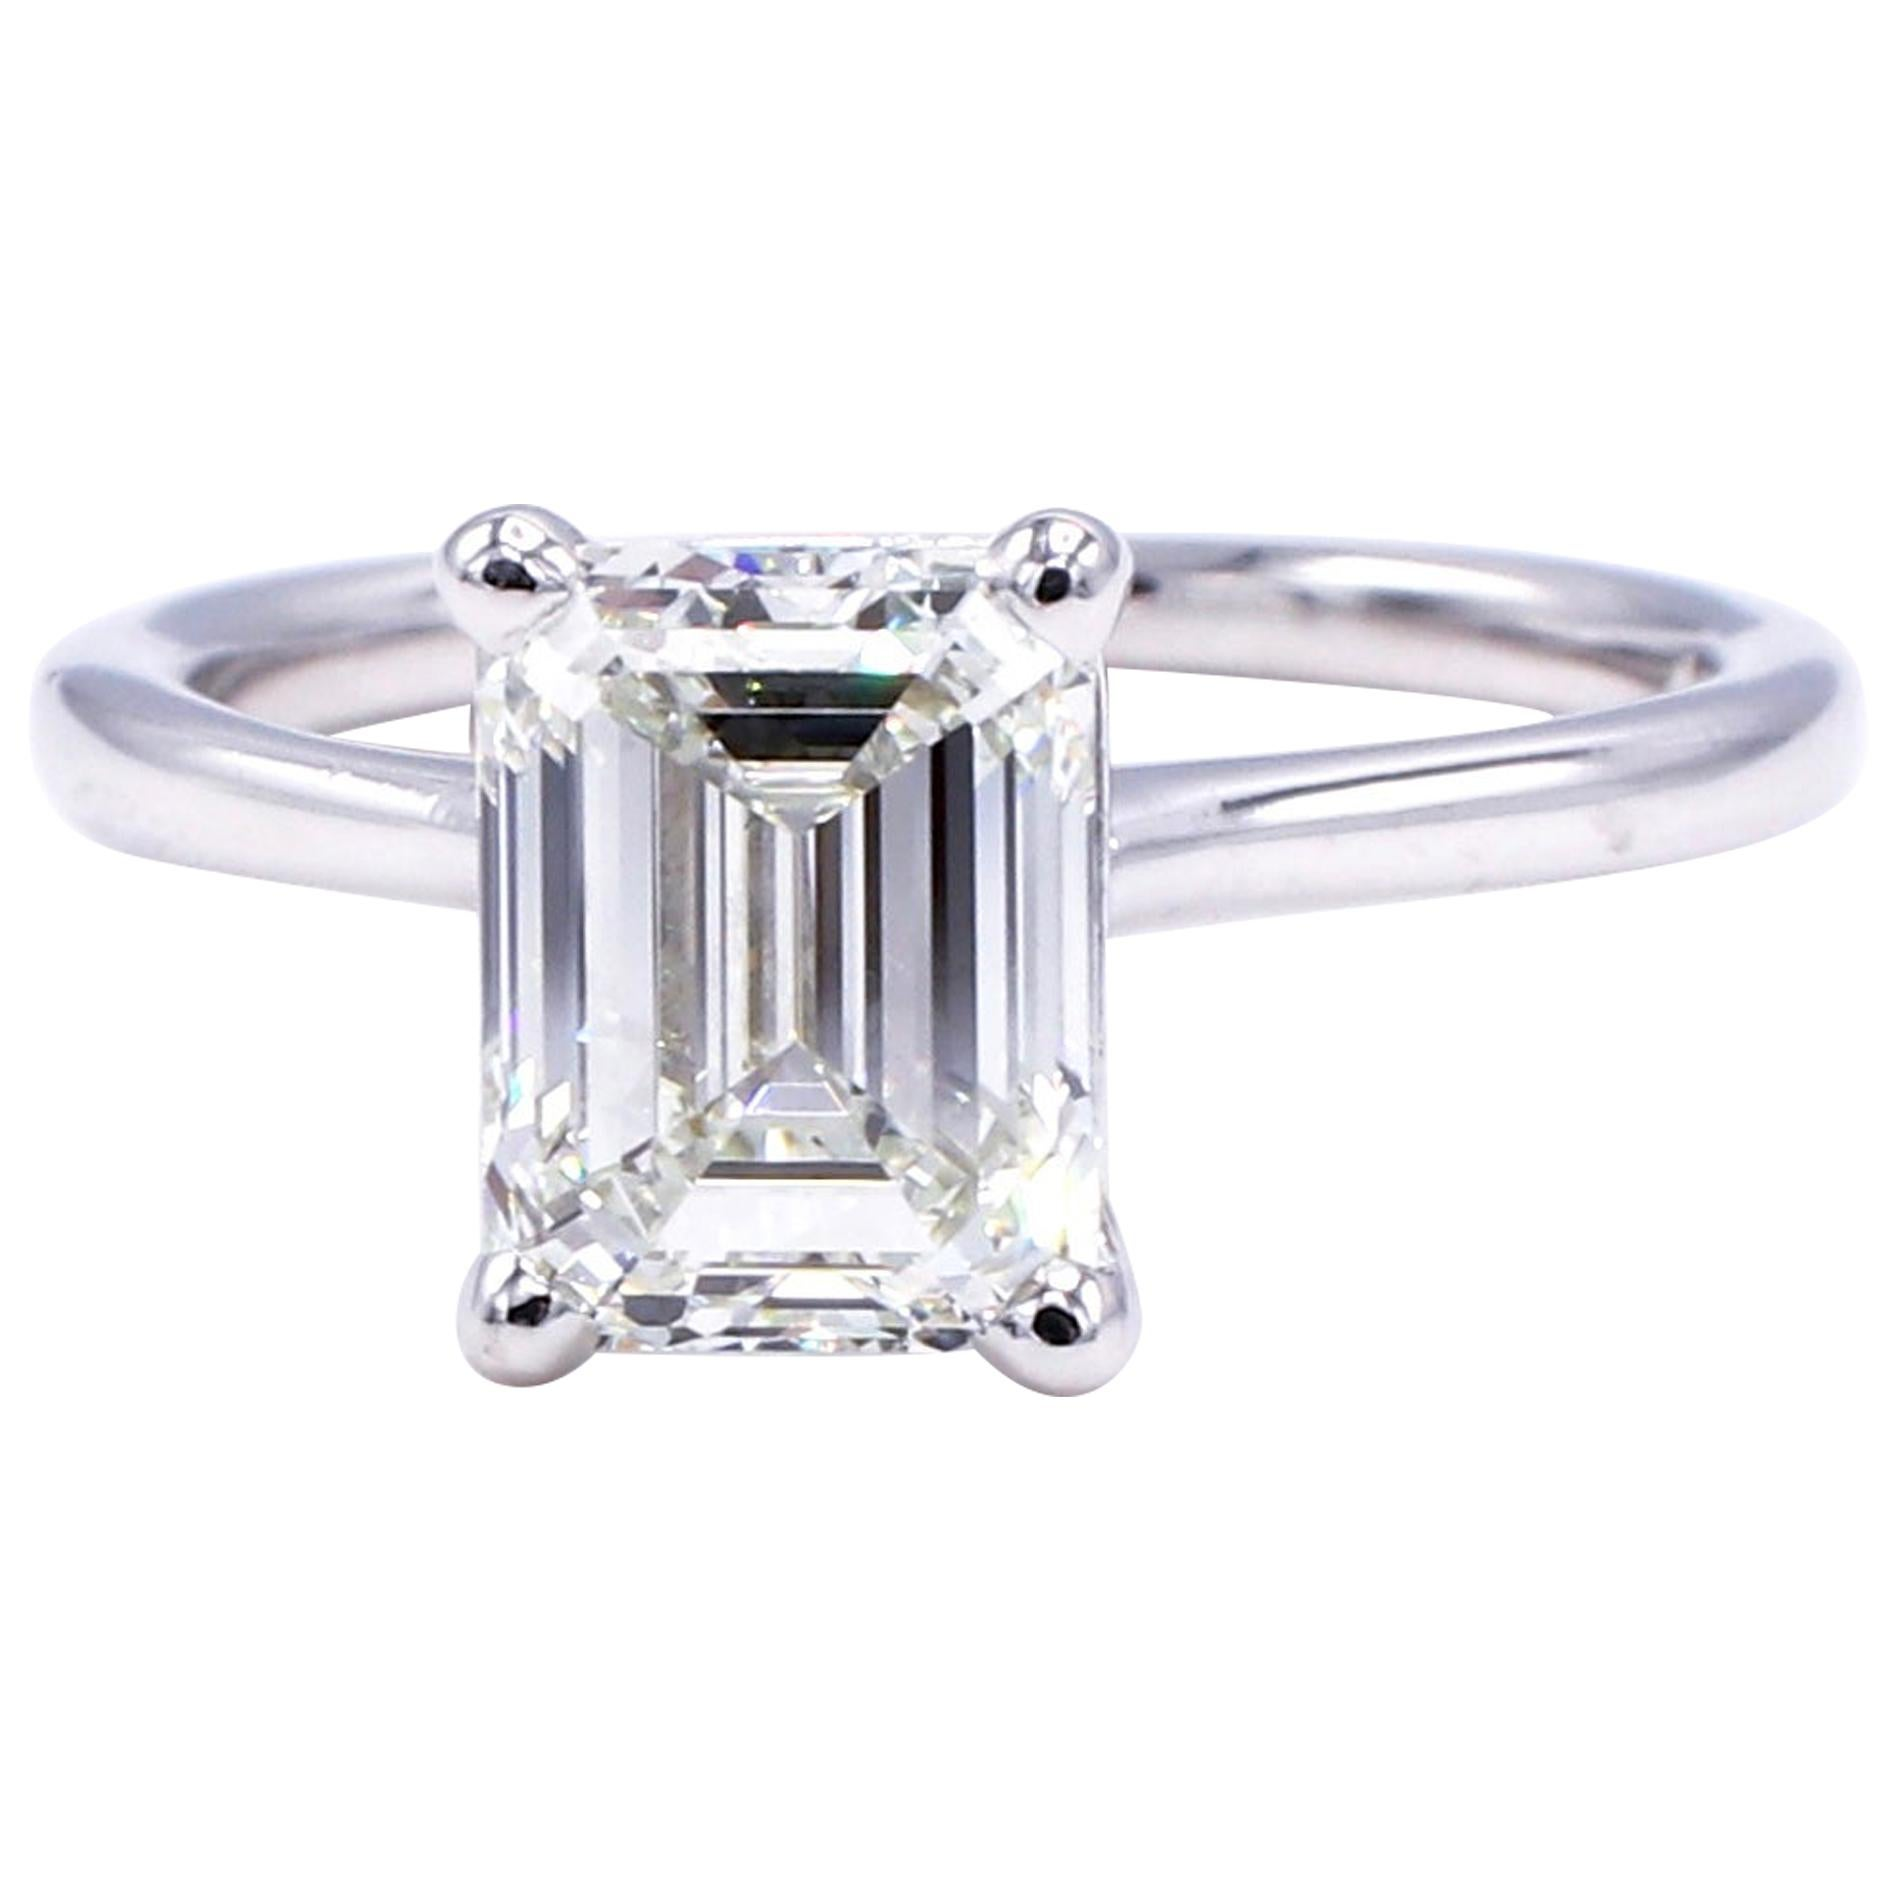 GIA Certified 2.03 Carat Emerald Cut Solitaire Diamond Platinum Engagement Ring